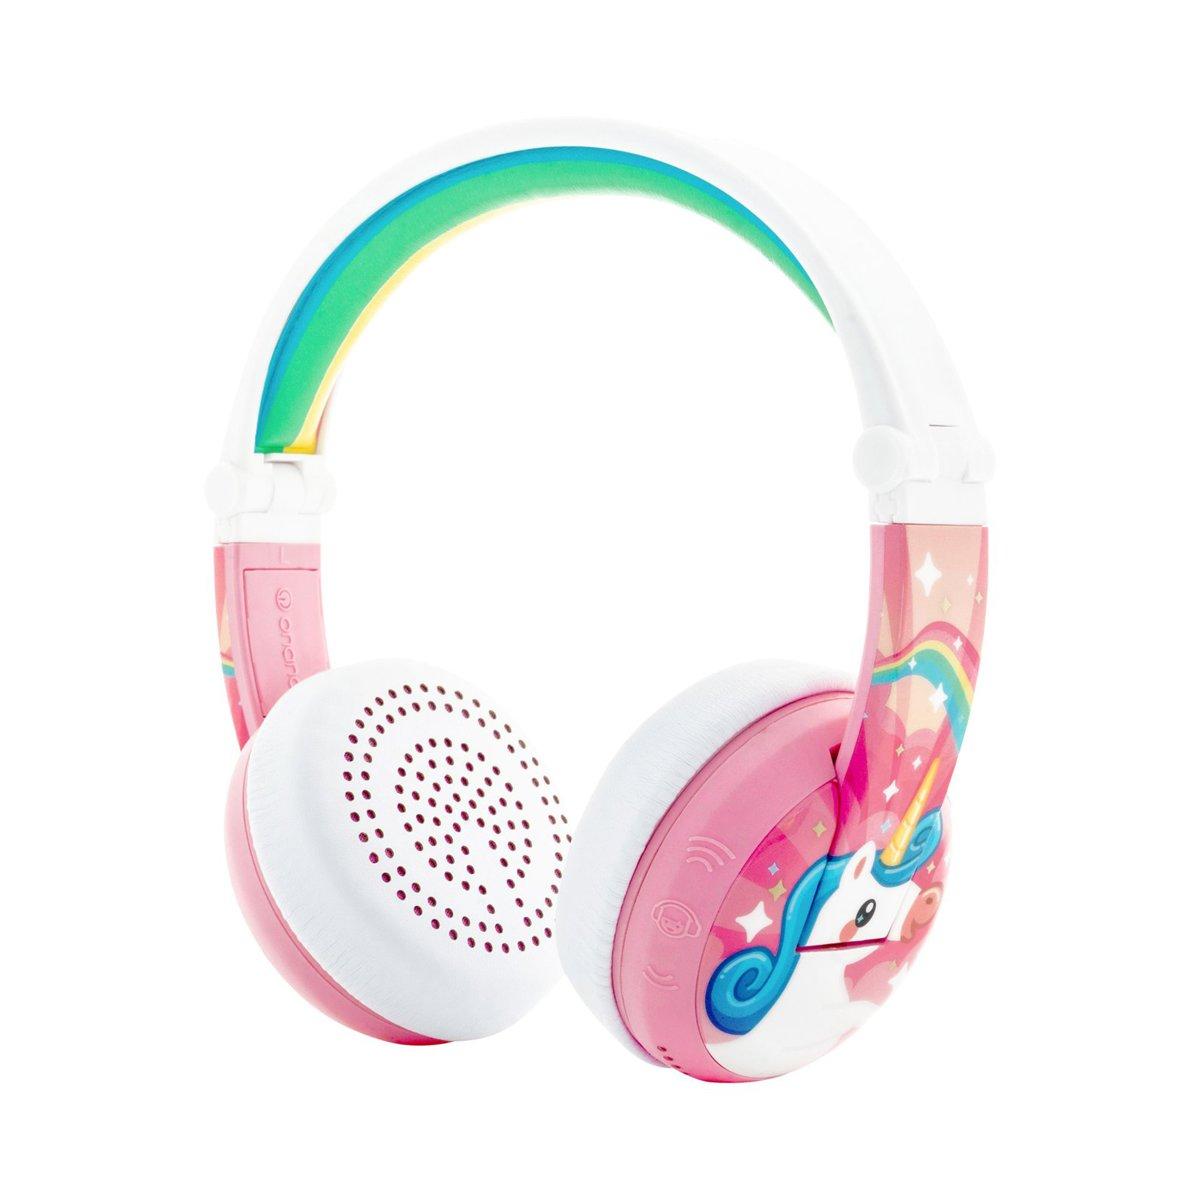 BUDDYPHONES HEADPHONE OVER-EAR